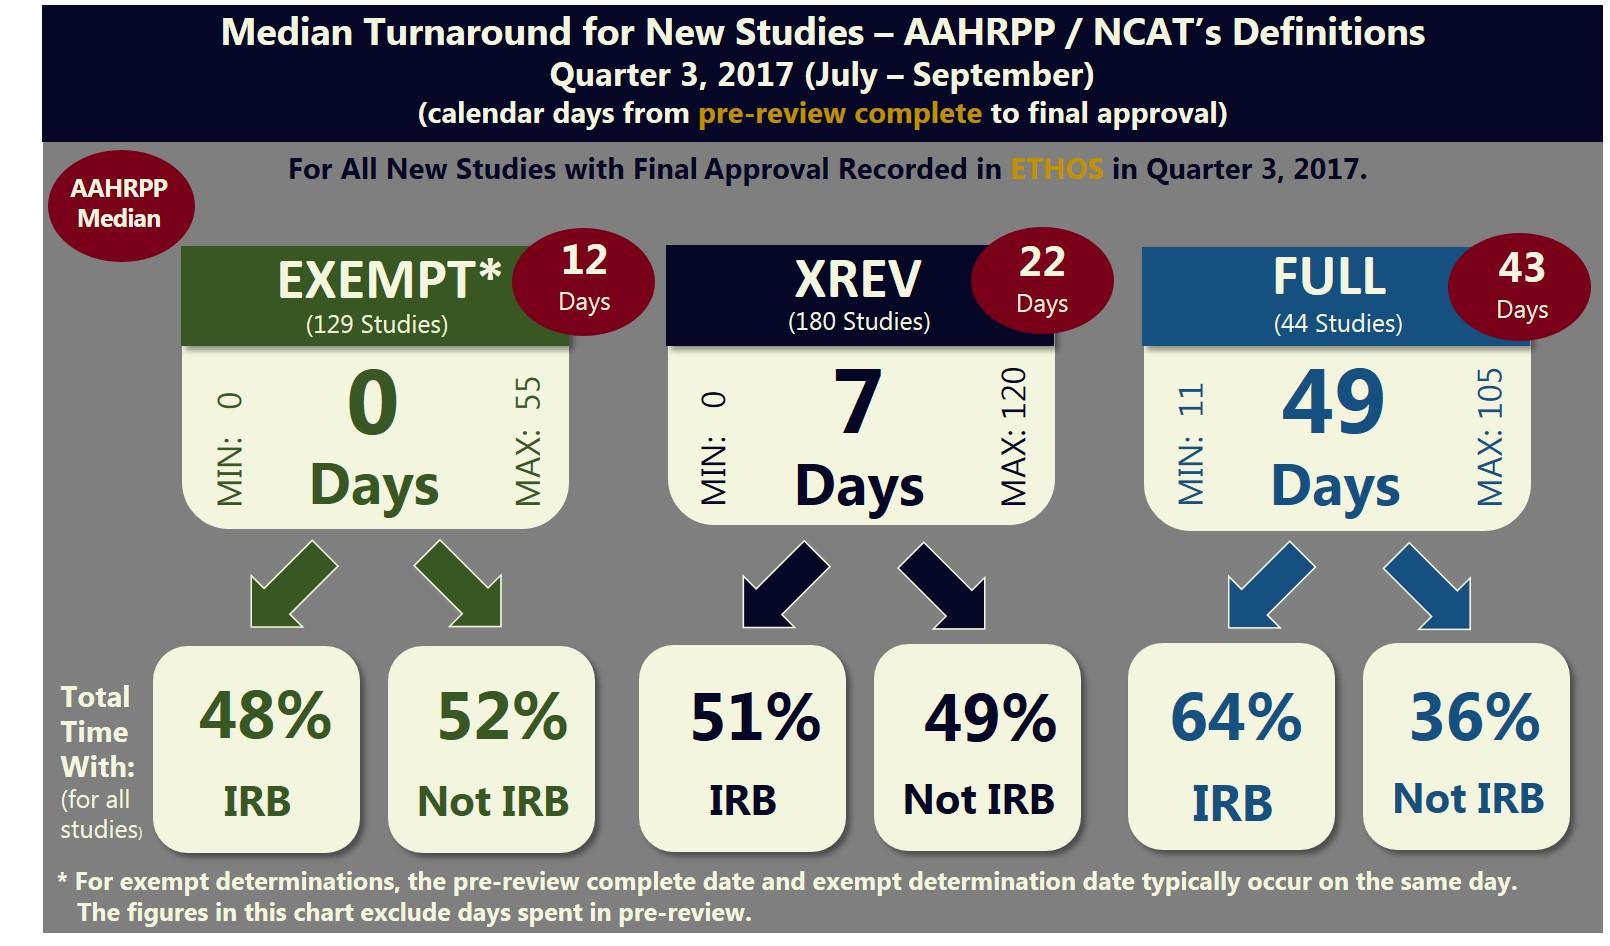 Overall Median Turnaround